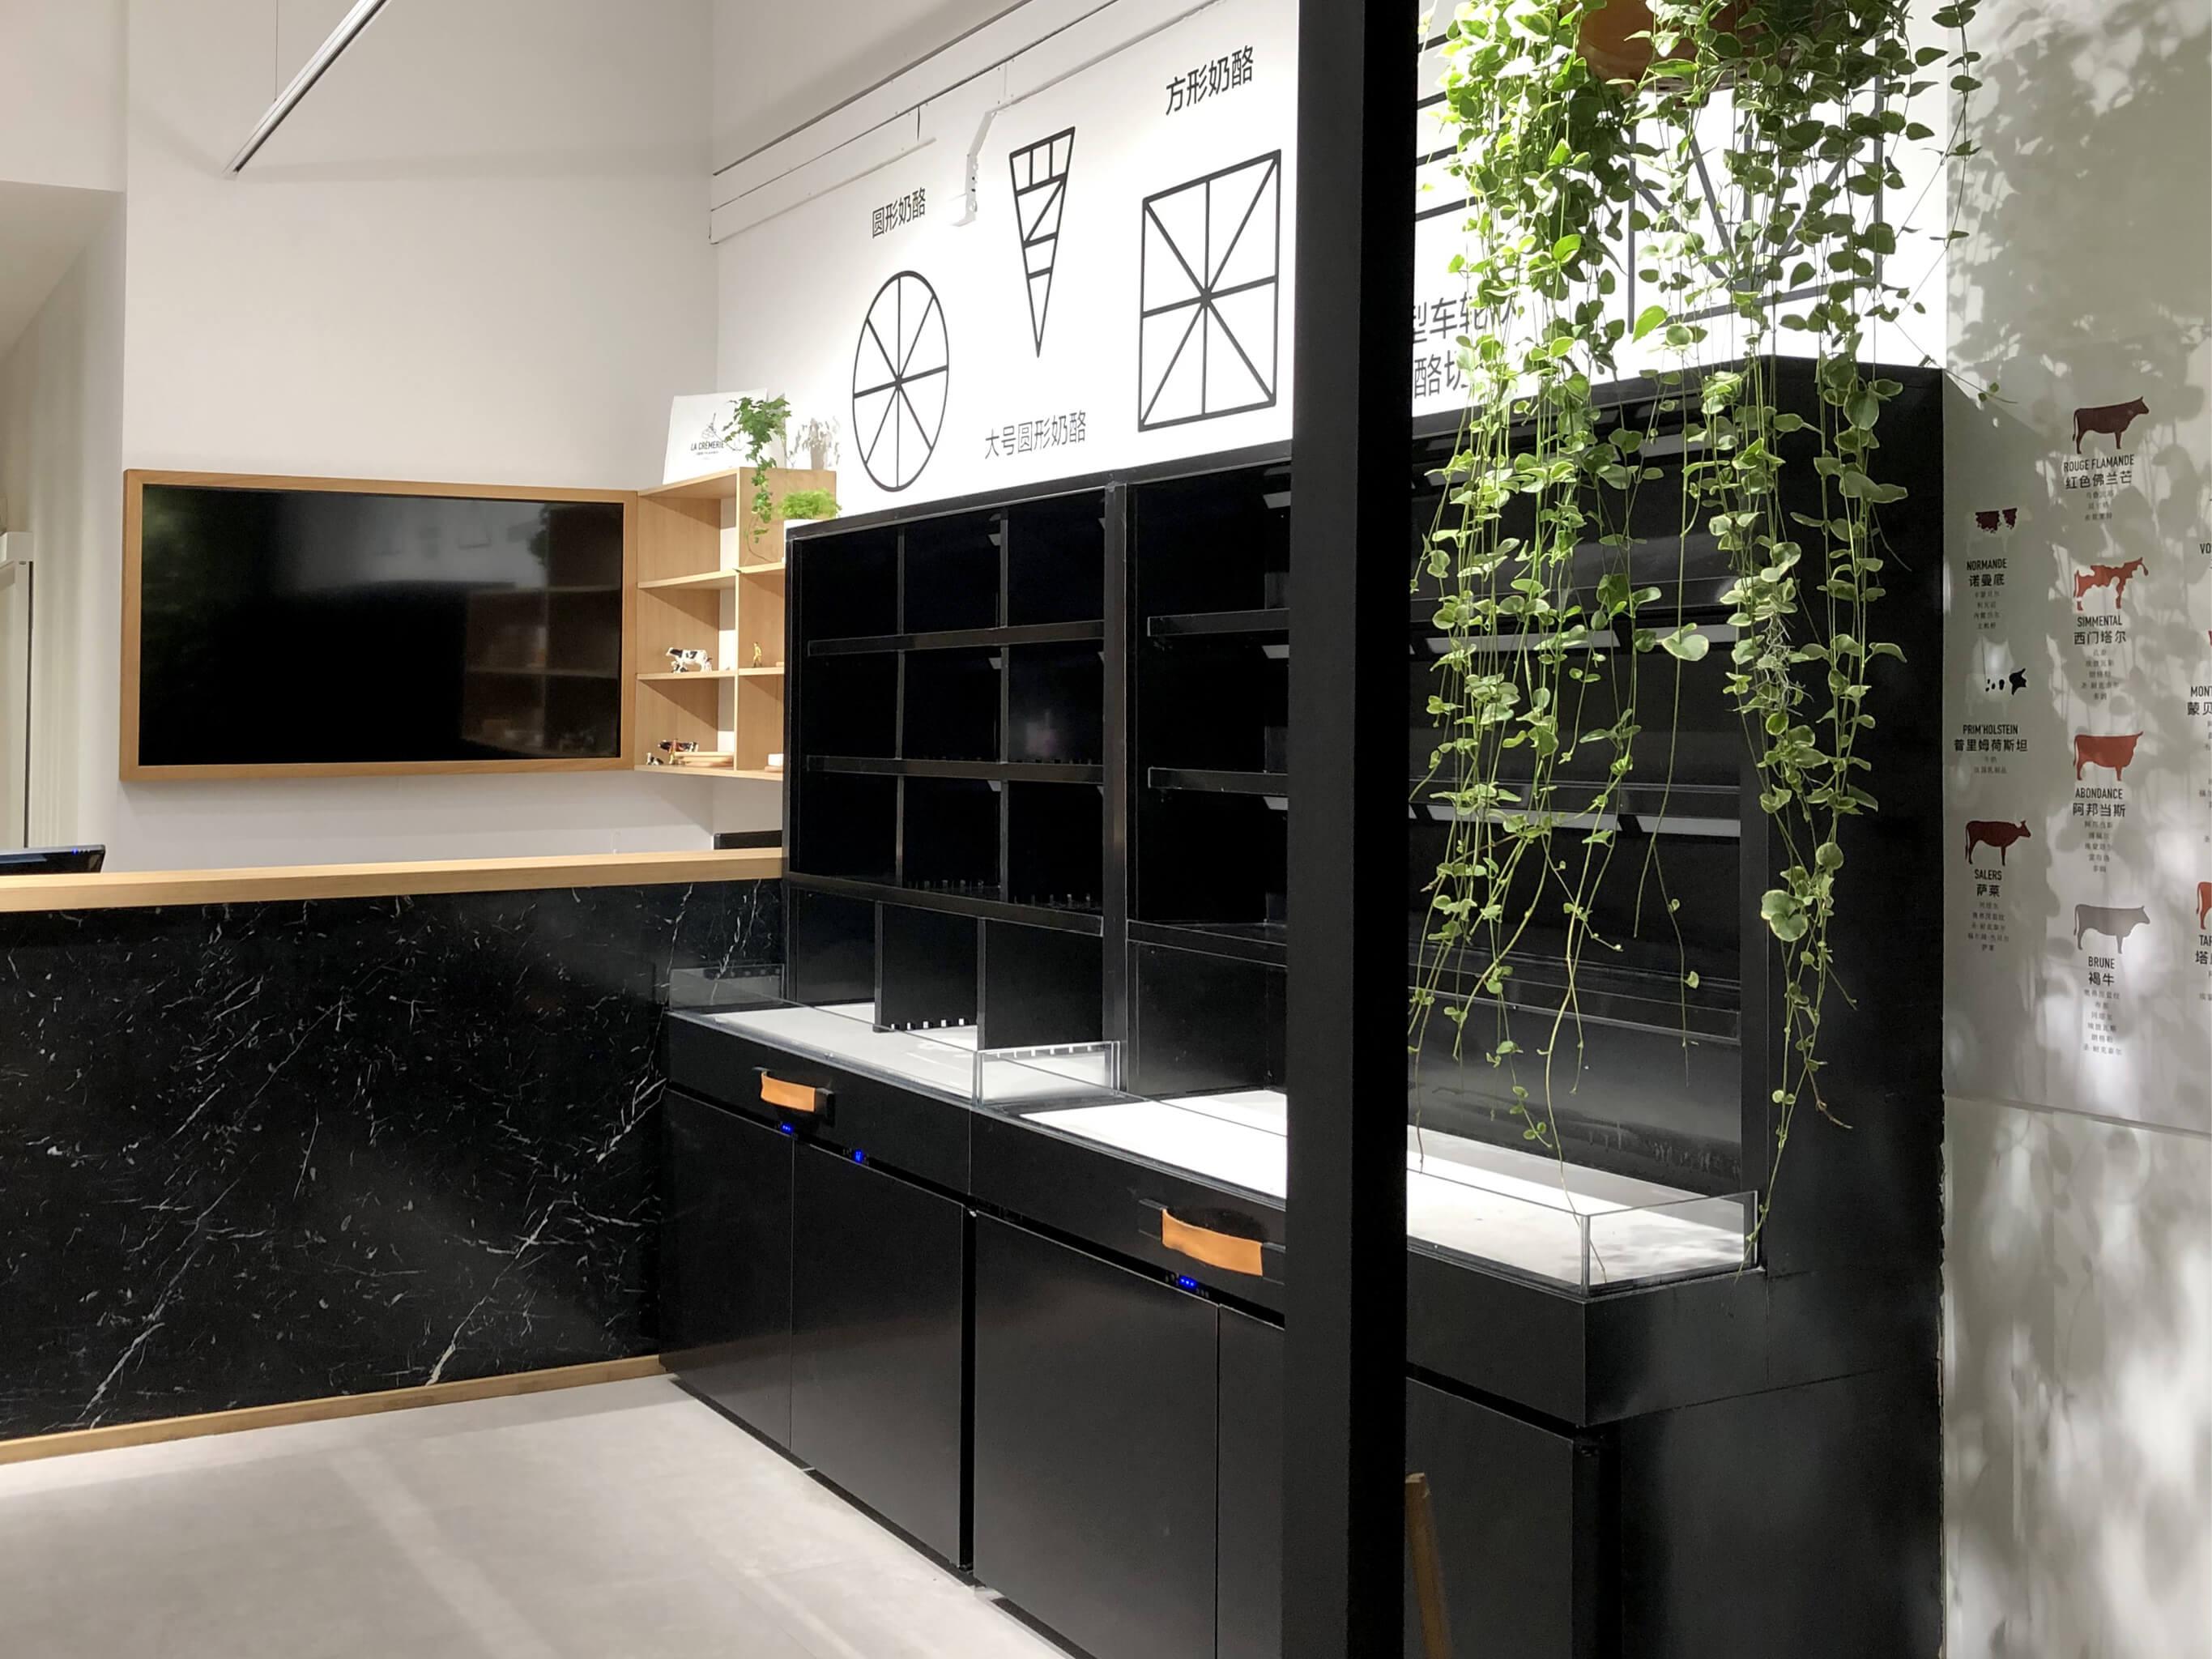 la-cremerie-mobilier-frigo-design-ichetkar2